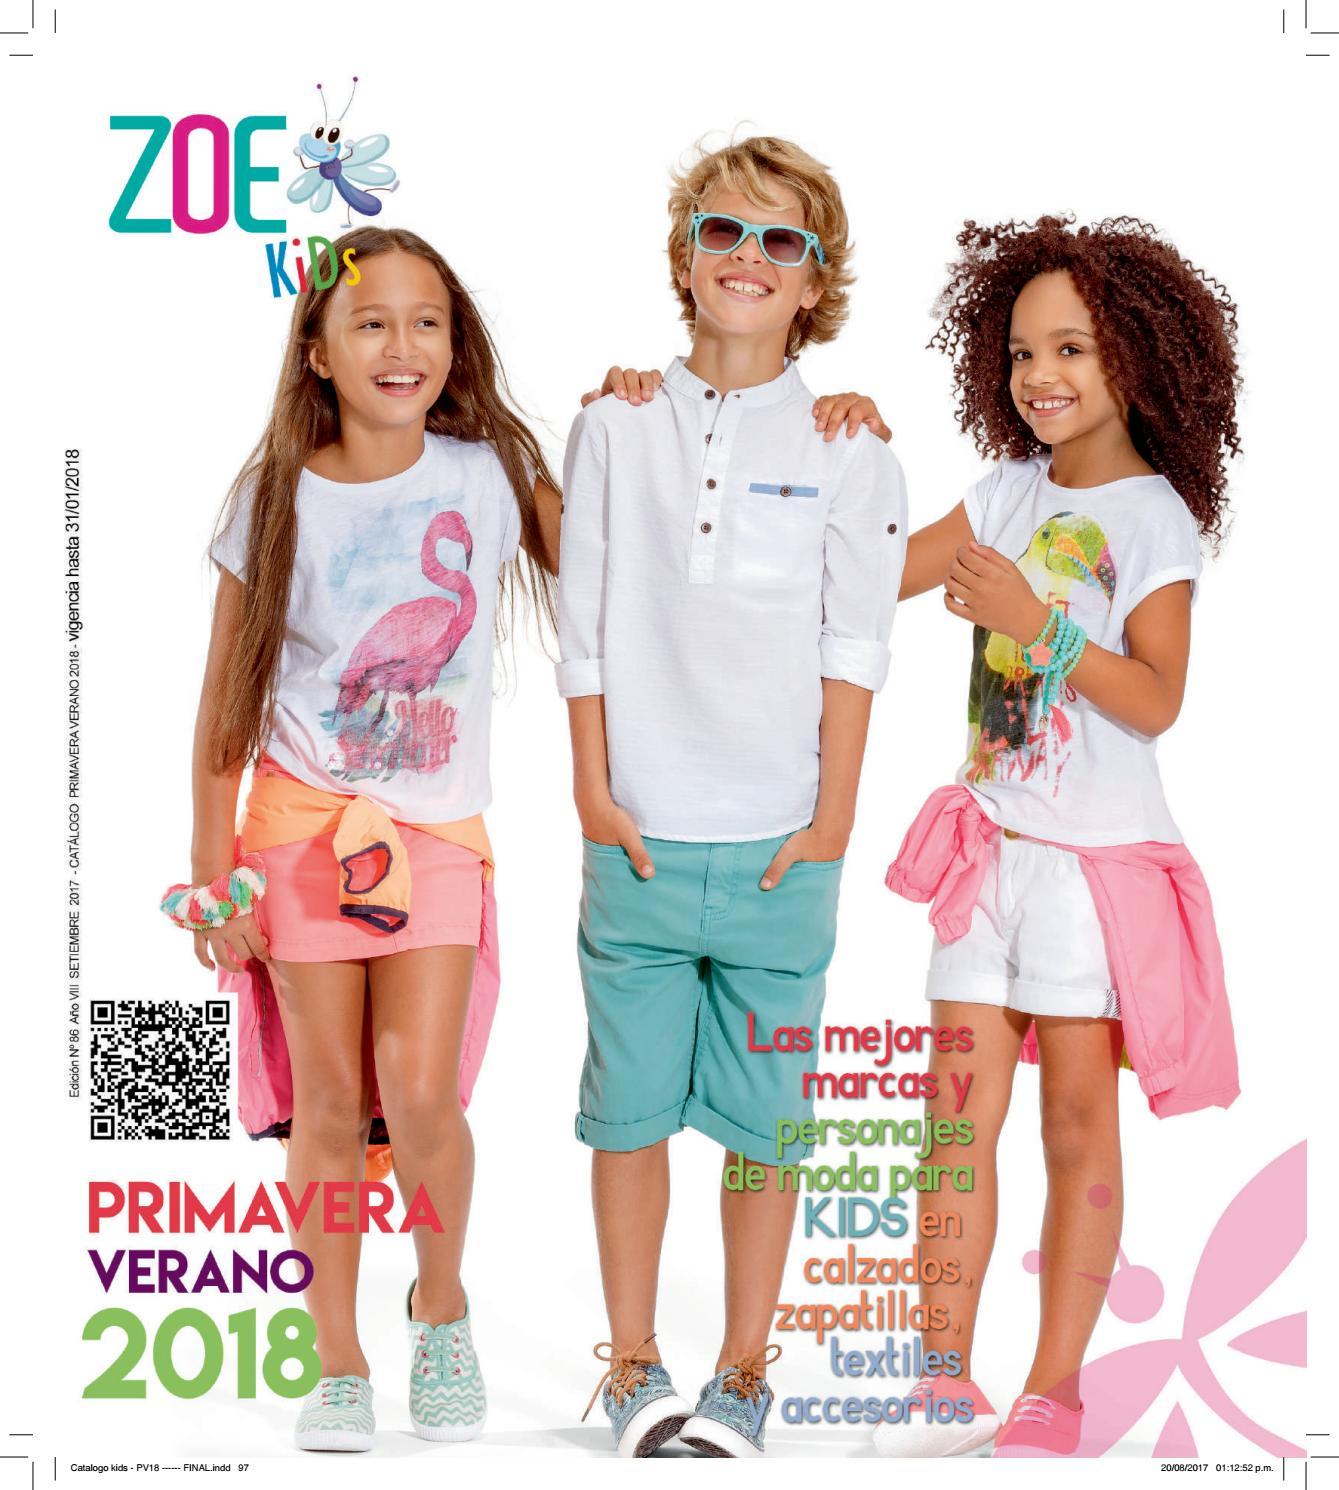 Catálogo Kids Primavera Verano 2018 by Catálogos Zoe